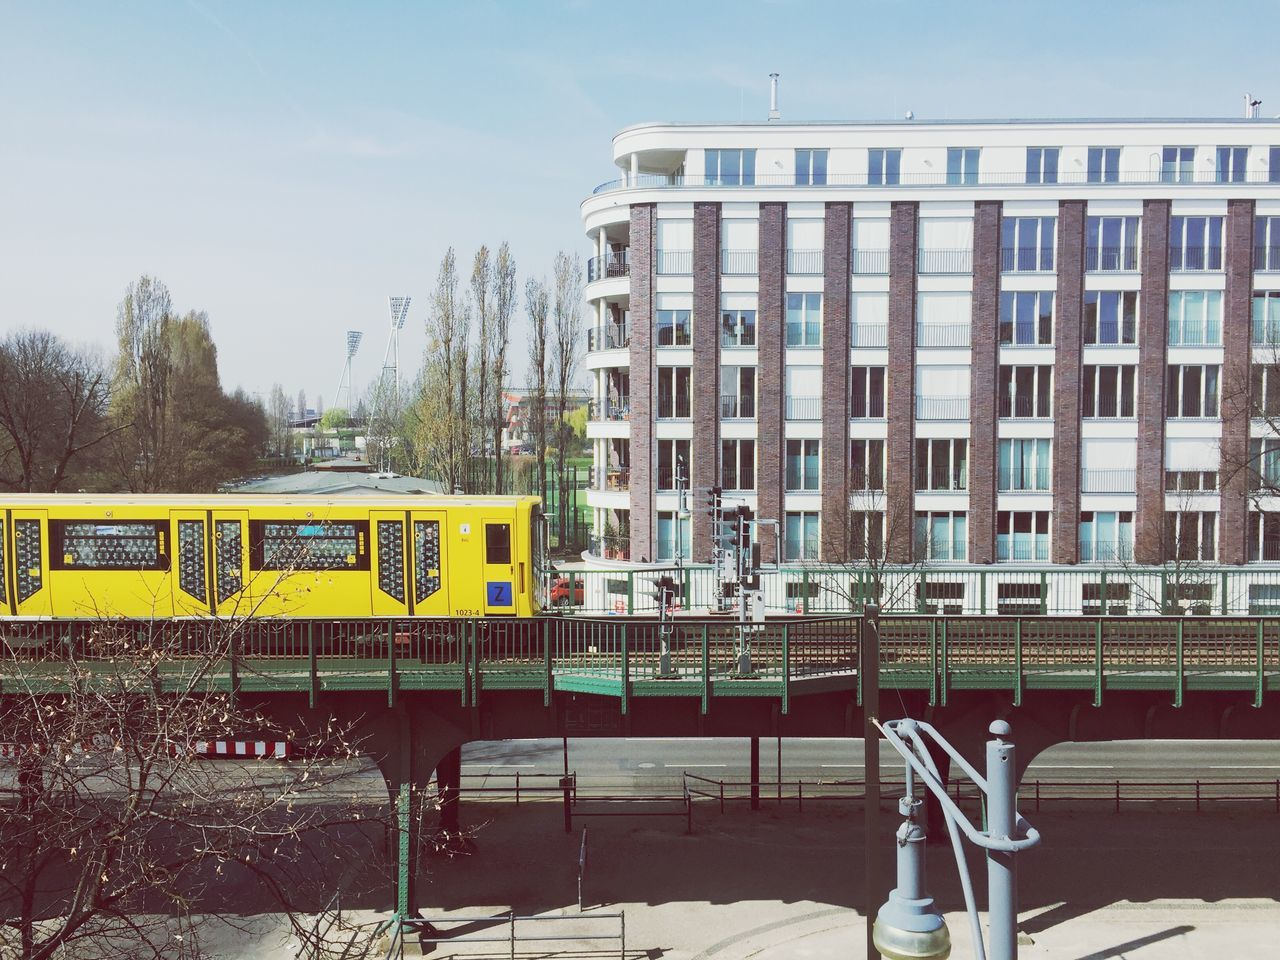 Startup Tram Bvg Train Subway Building My Fuckin Berlin